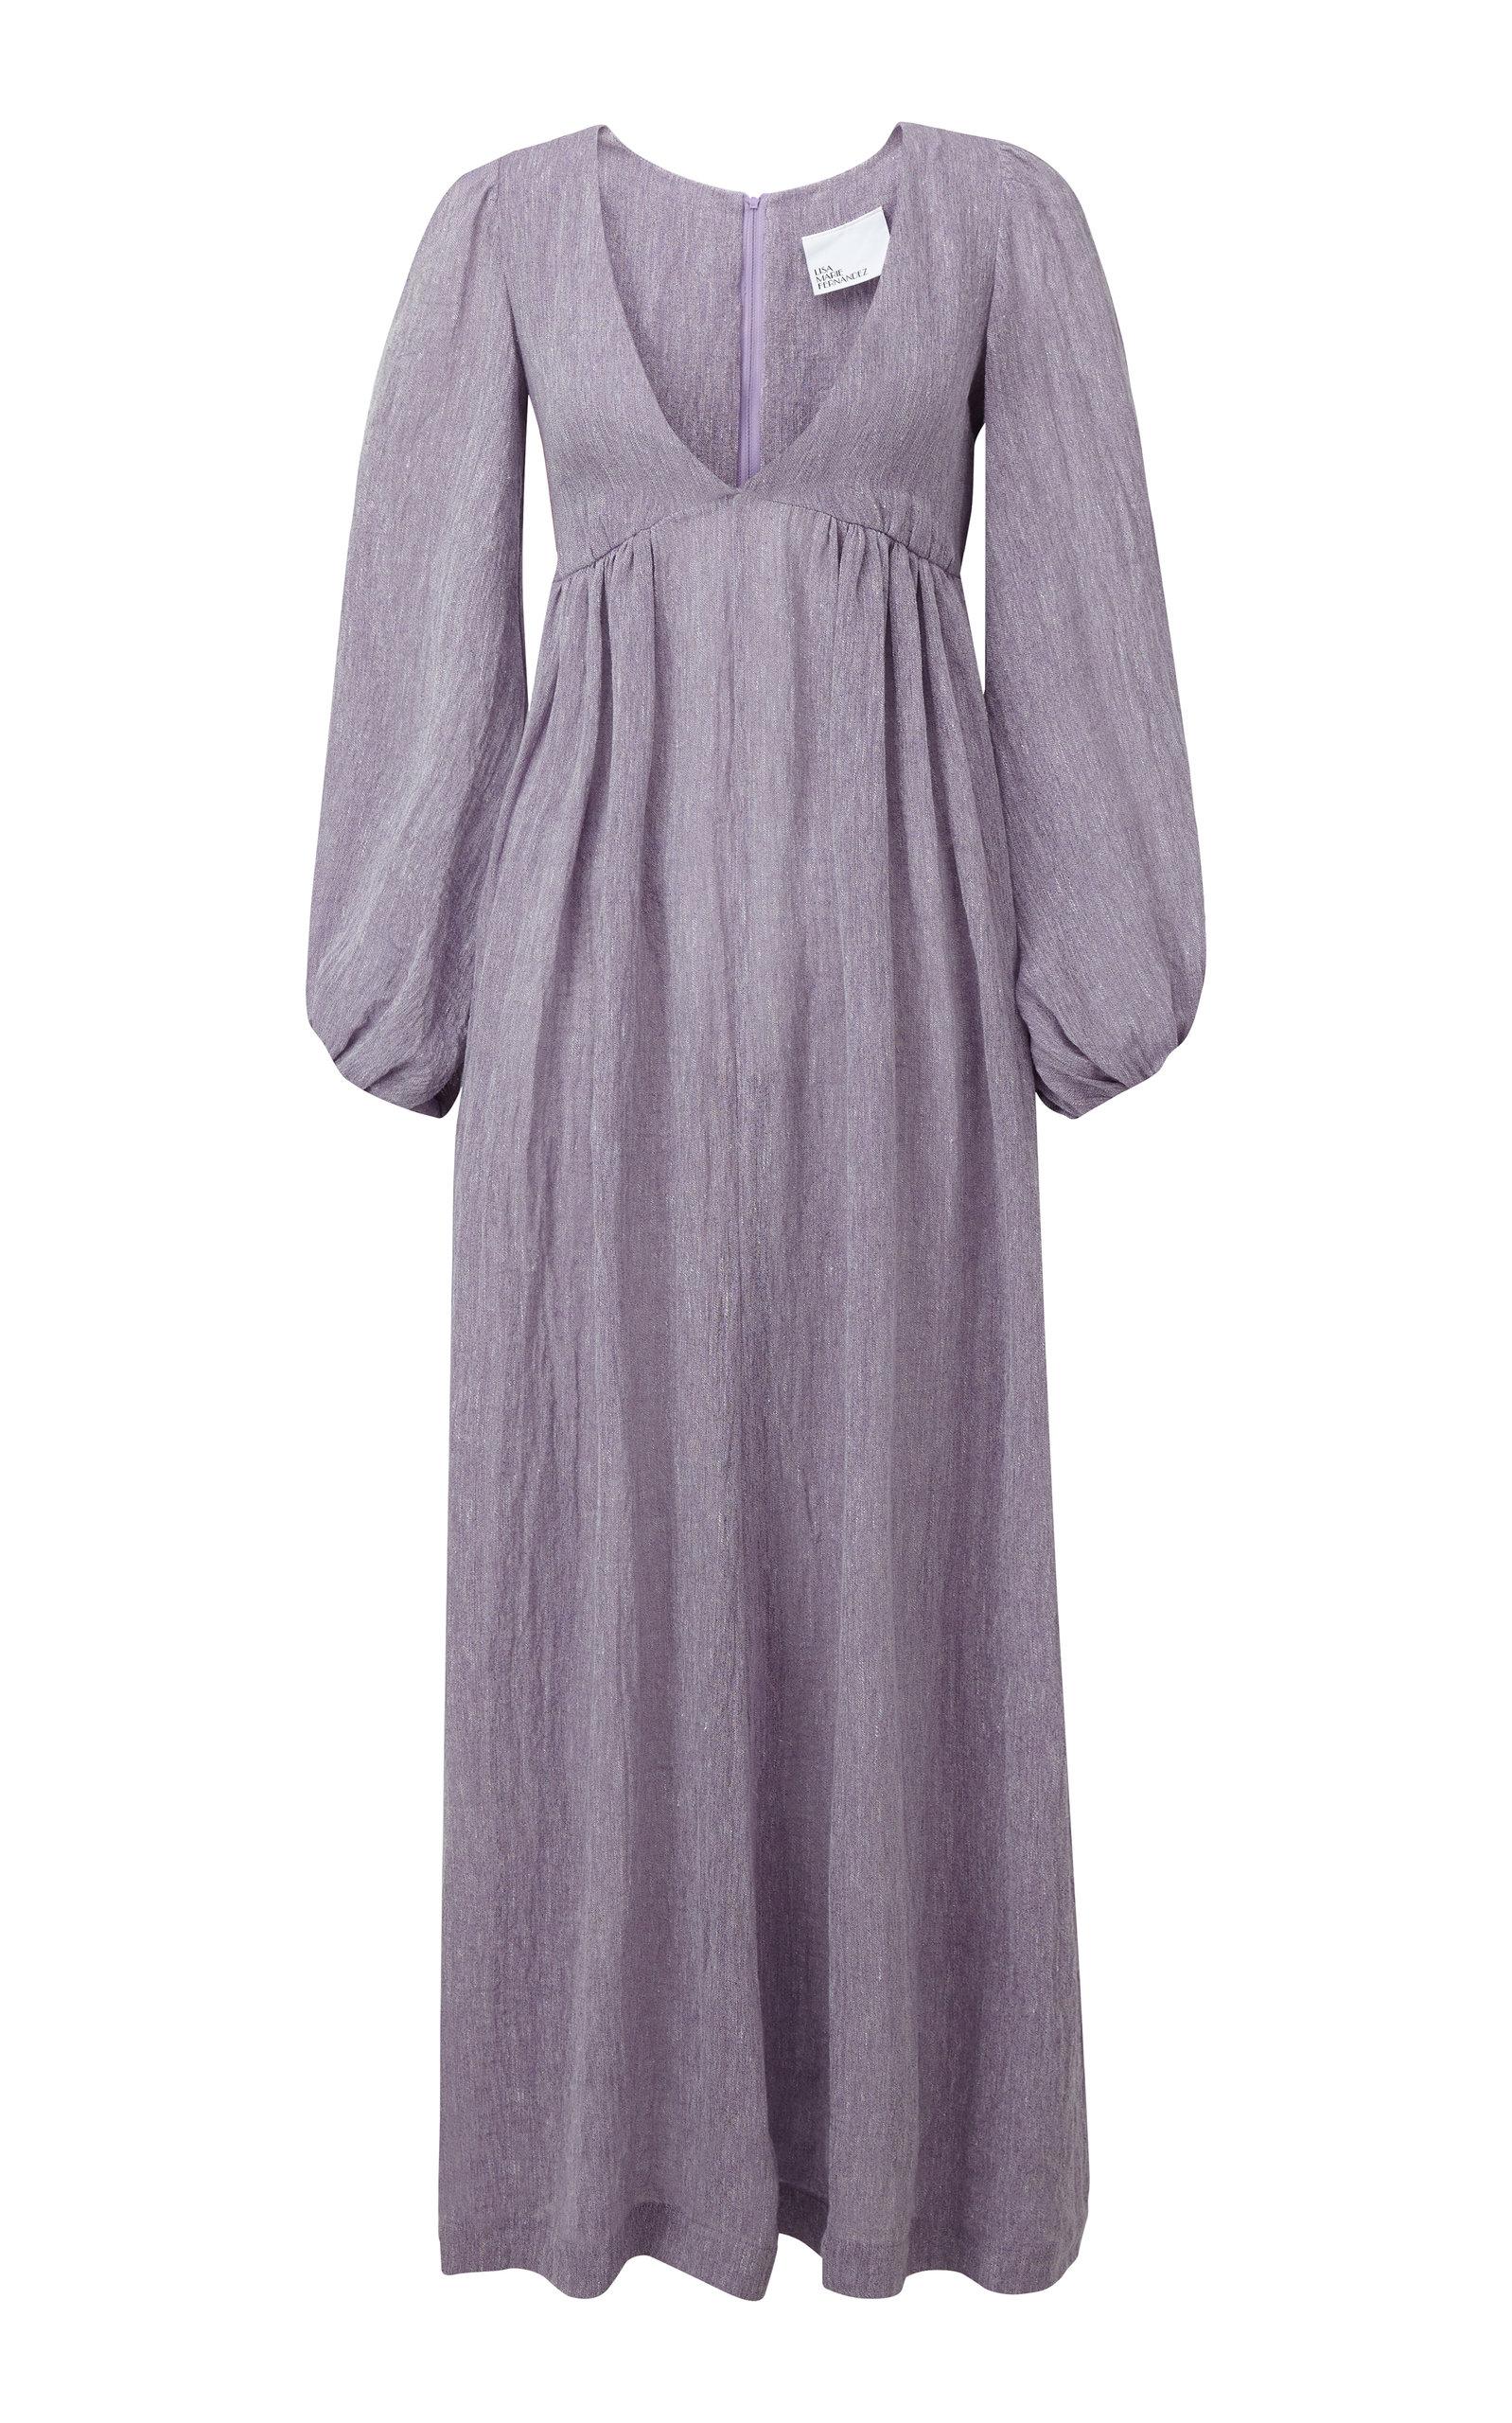 Buy Lisa Marie Fernandez Carolyn Bow-Embellished Linen-Blend Maxi Dress online, shop Lisa Marie Fernandez at the best price